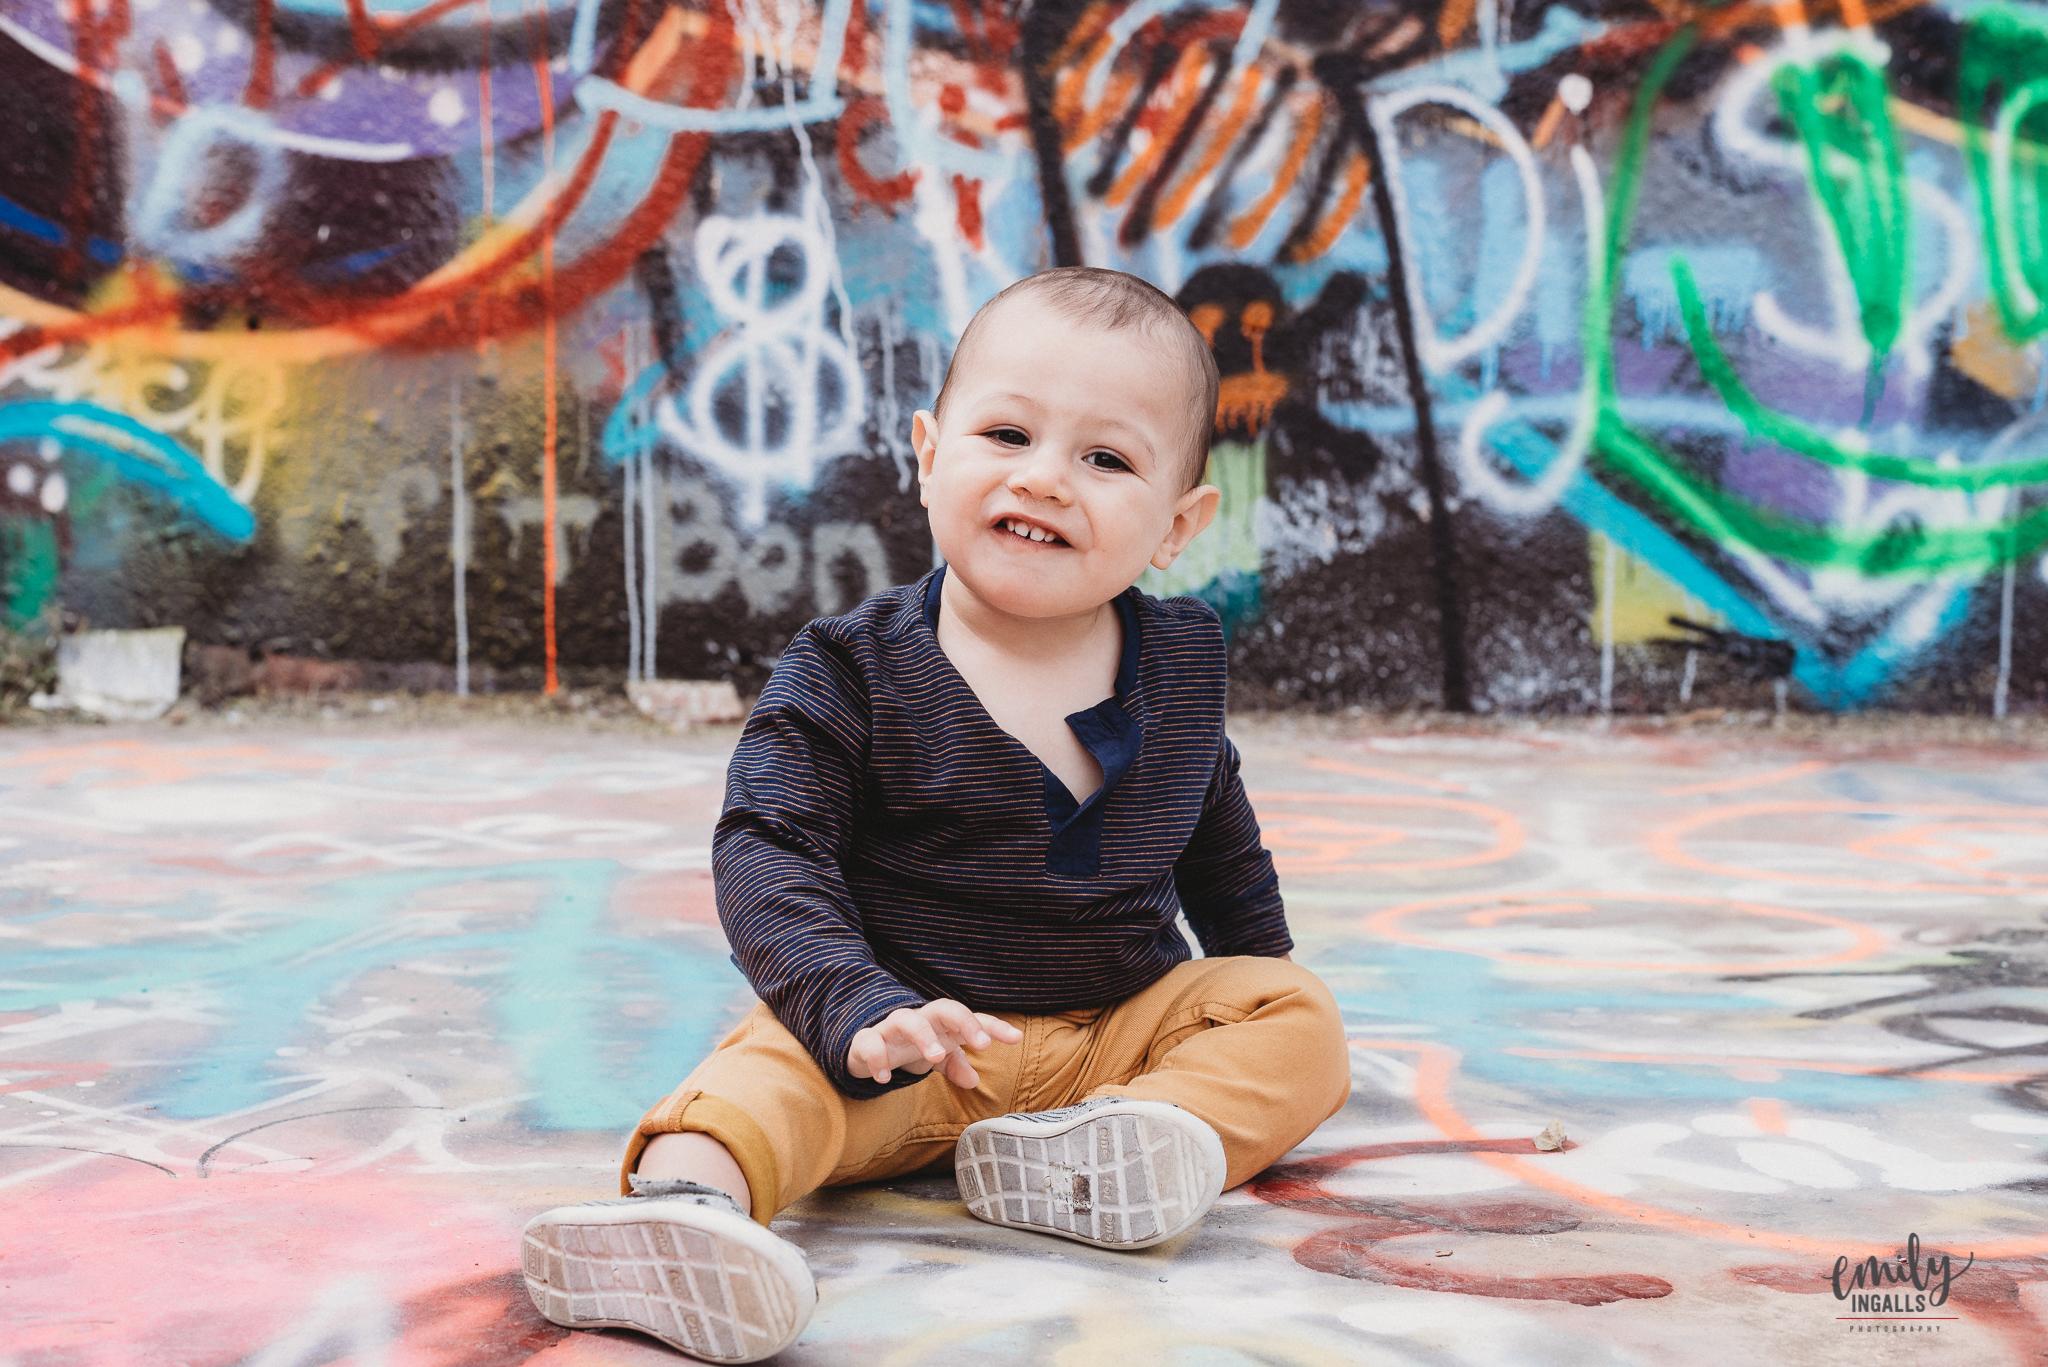 Family Photographer_Round Rock Photographer_Emily Ingalls Photography_Austin Photographer_Pflugerville Photographer_Georgetown Photographer_Graffiti Hill at Castle Park, Austin-10.jpg